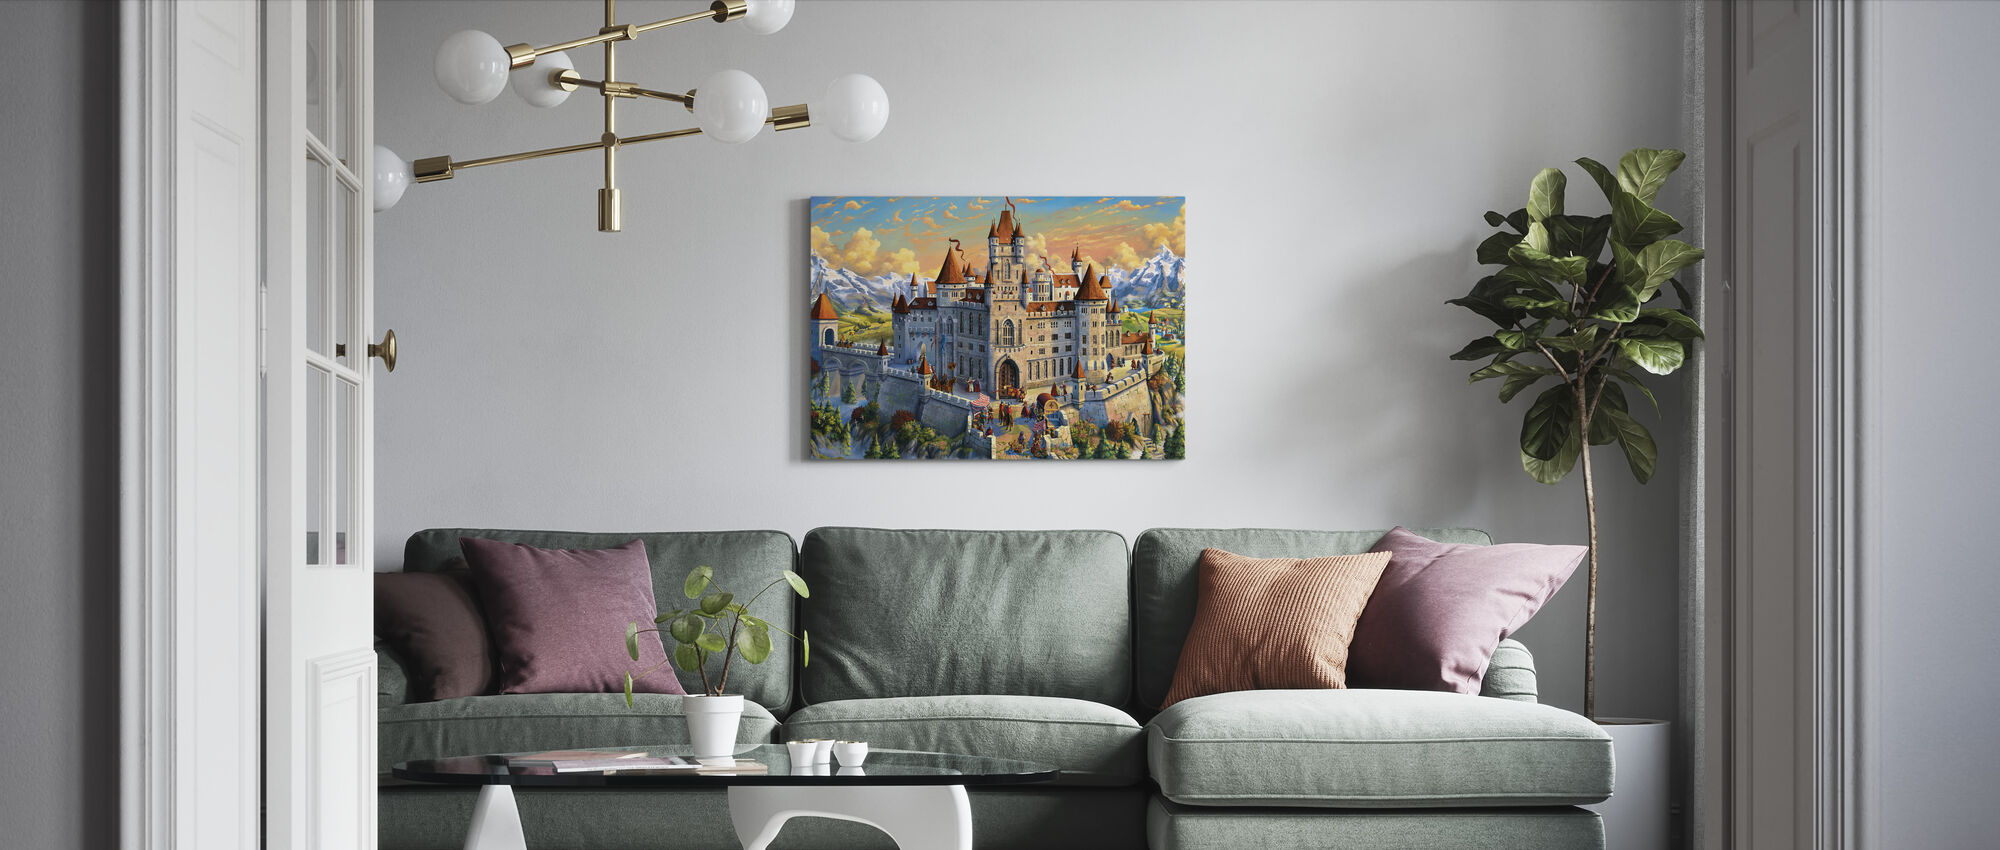 Magnificant Castle - Canvas print - Living Room